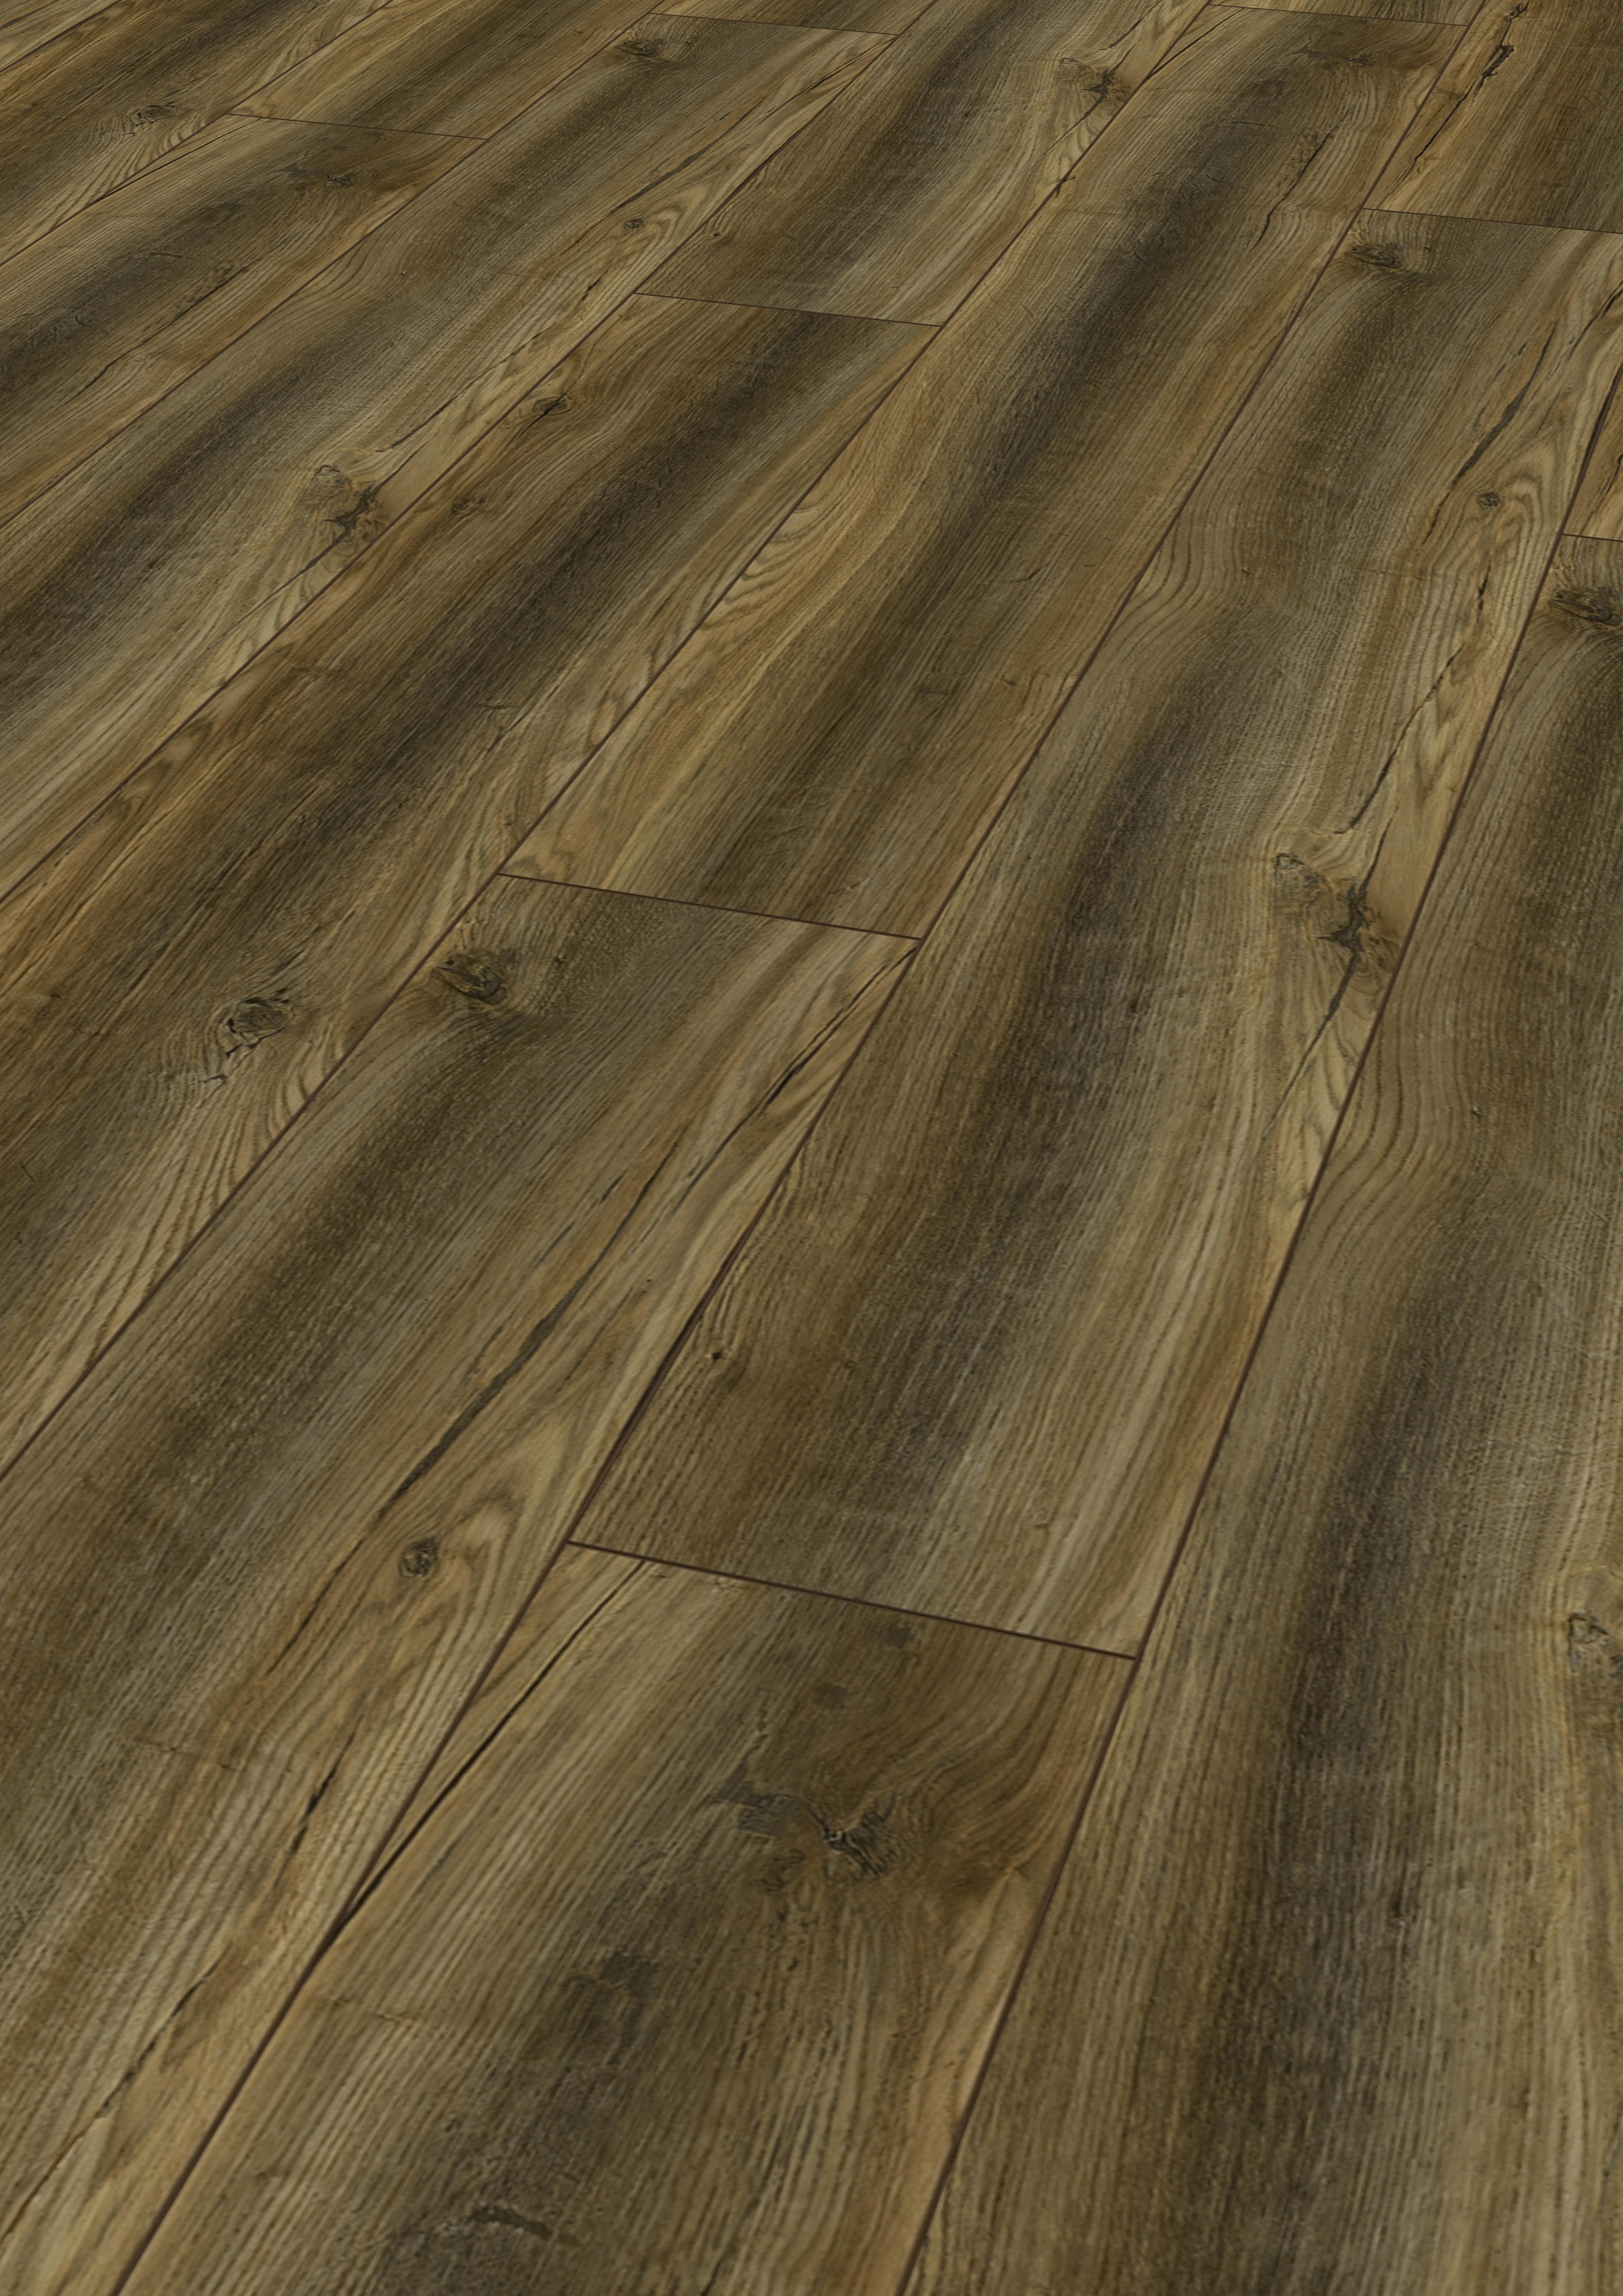 Exquisit Swiss Krono, Monroe Park Collection Laminate Flooring Reviews